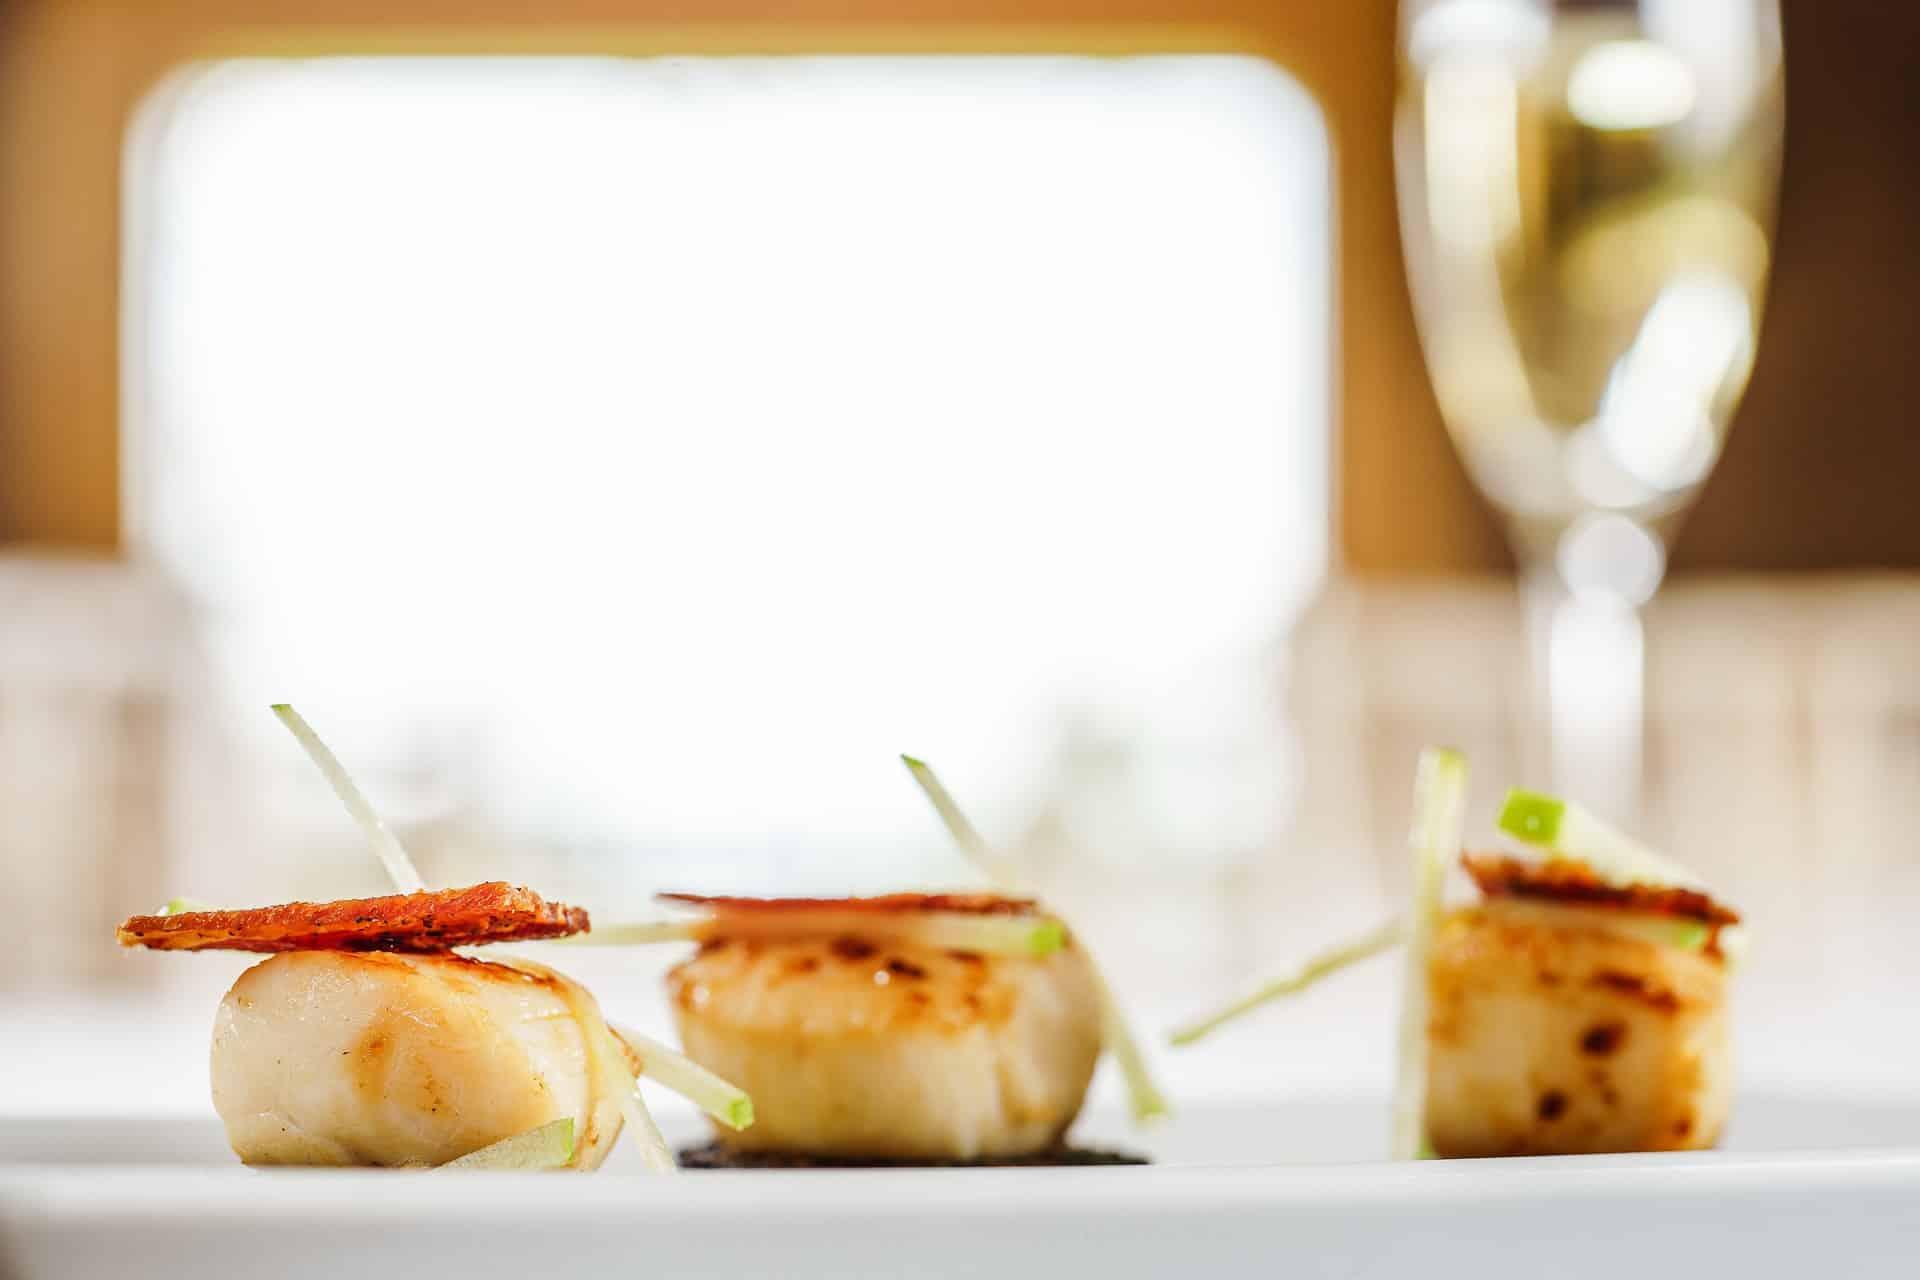 Line your stomach in Madrid's best restaurants